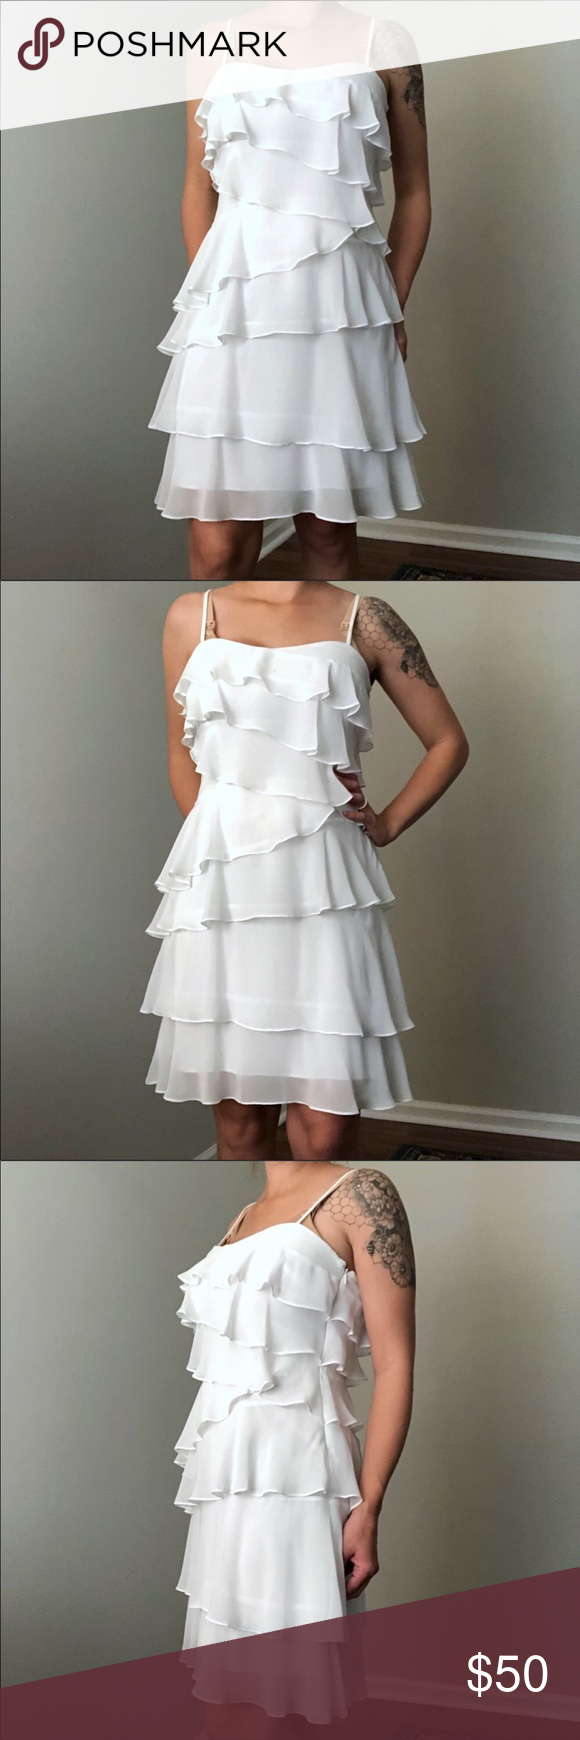 Calvin Klein White Tiered Ruffle Dress Size 6 Tiered Ruffle Dress Ruffle Dress Calvin Klein White [ 1740 x 580 Pixel ]